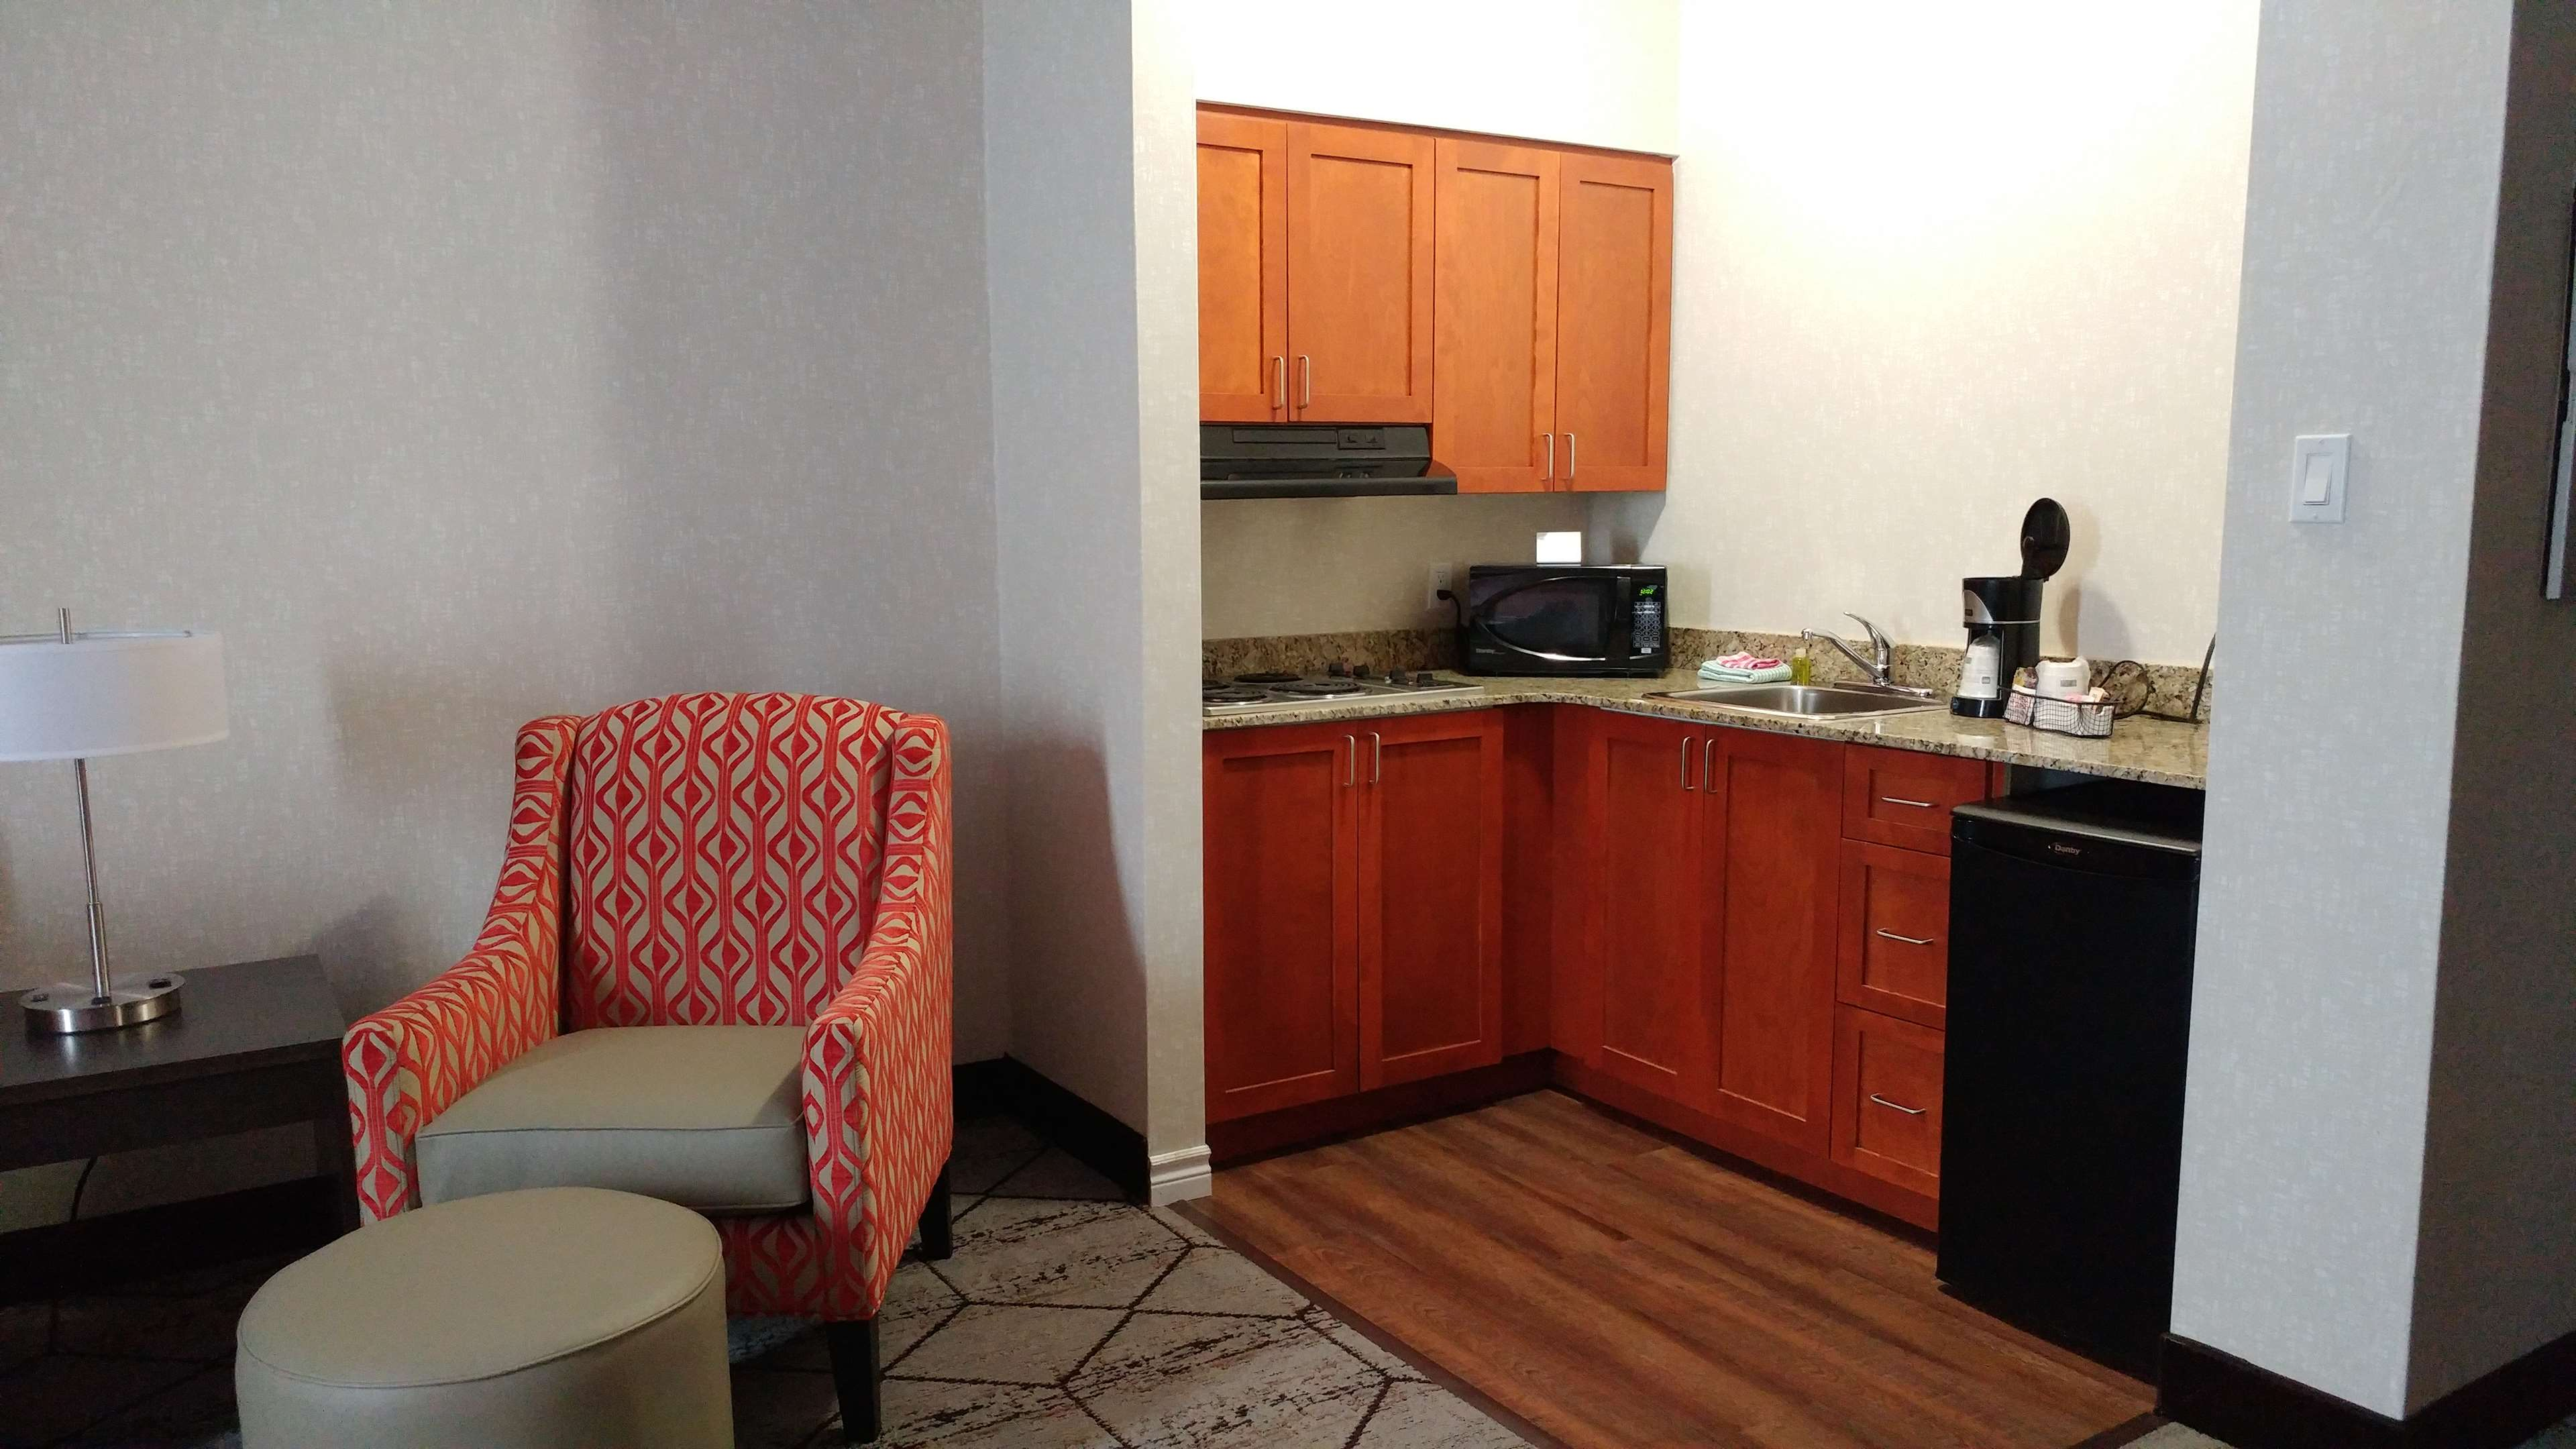 Best Western Plus Rose City Suites in Welland: Kitchenette Suite